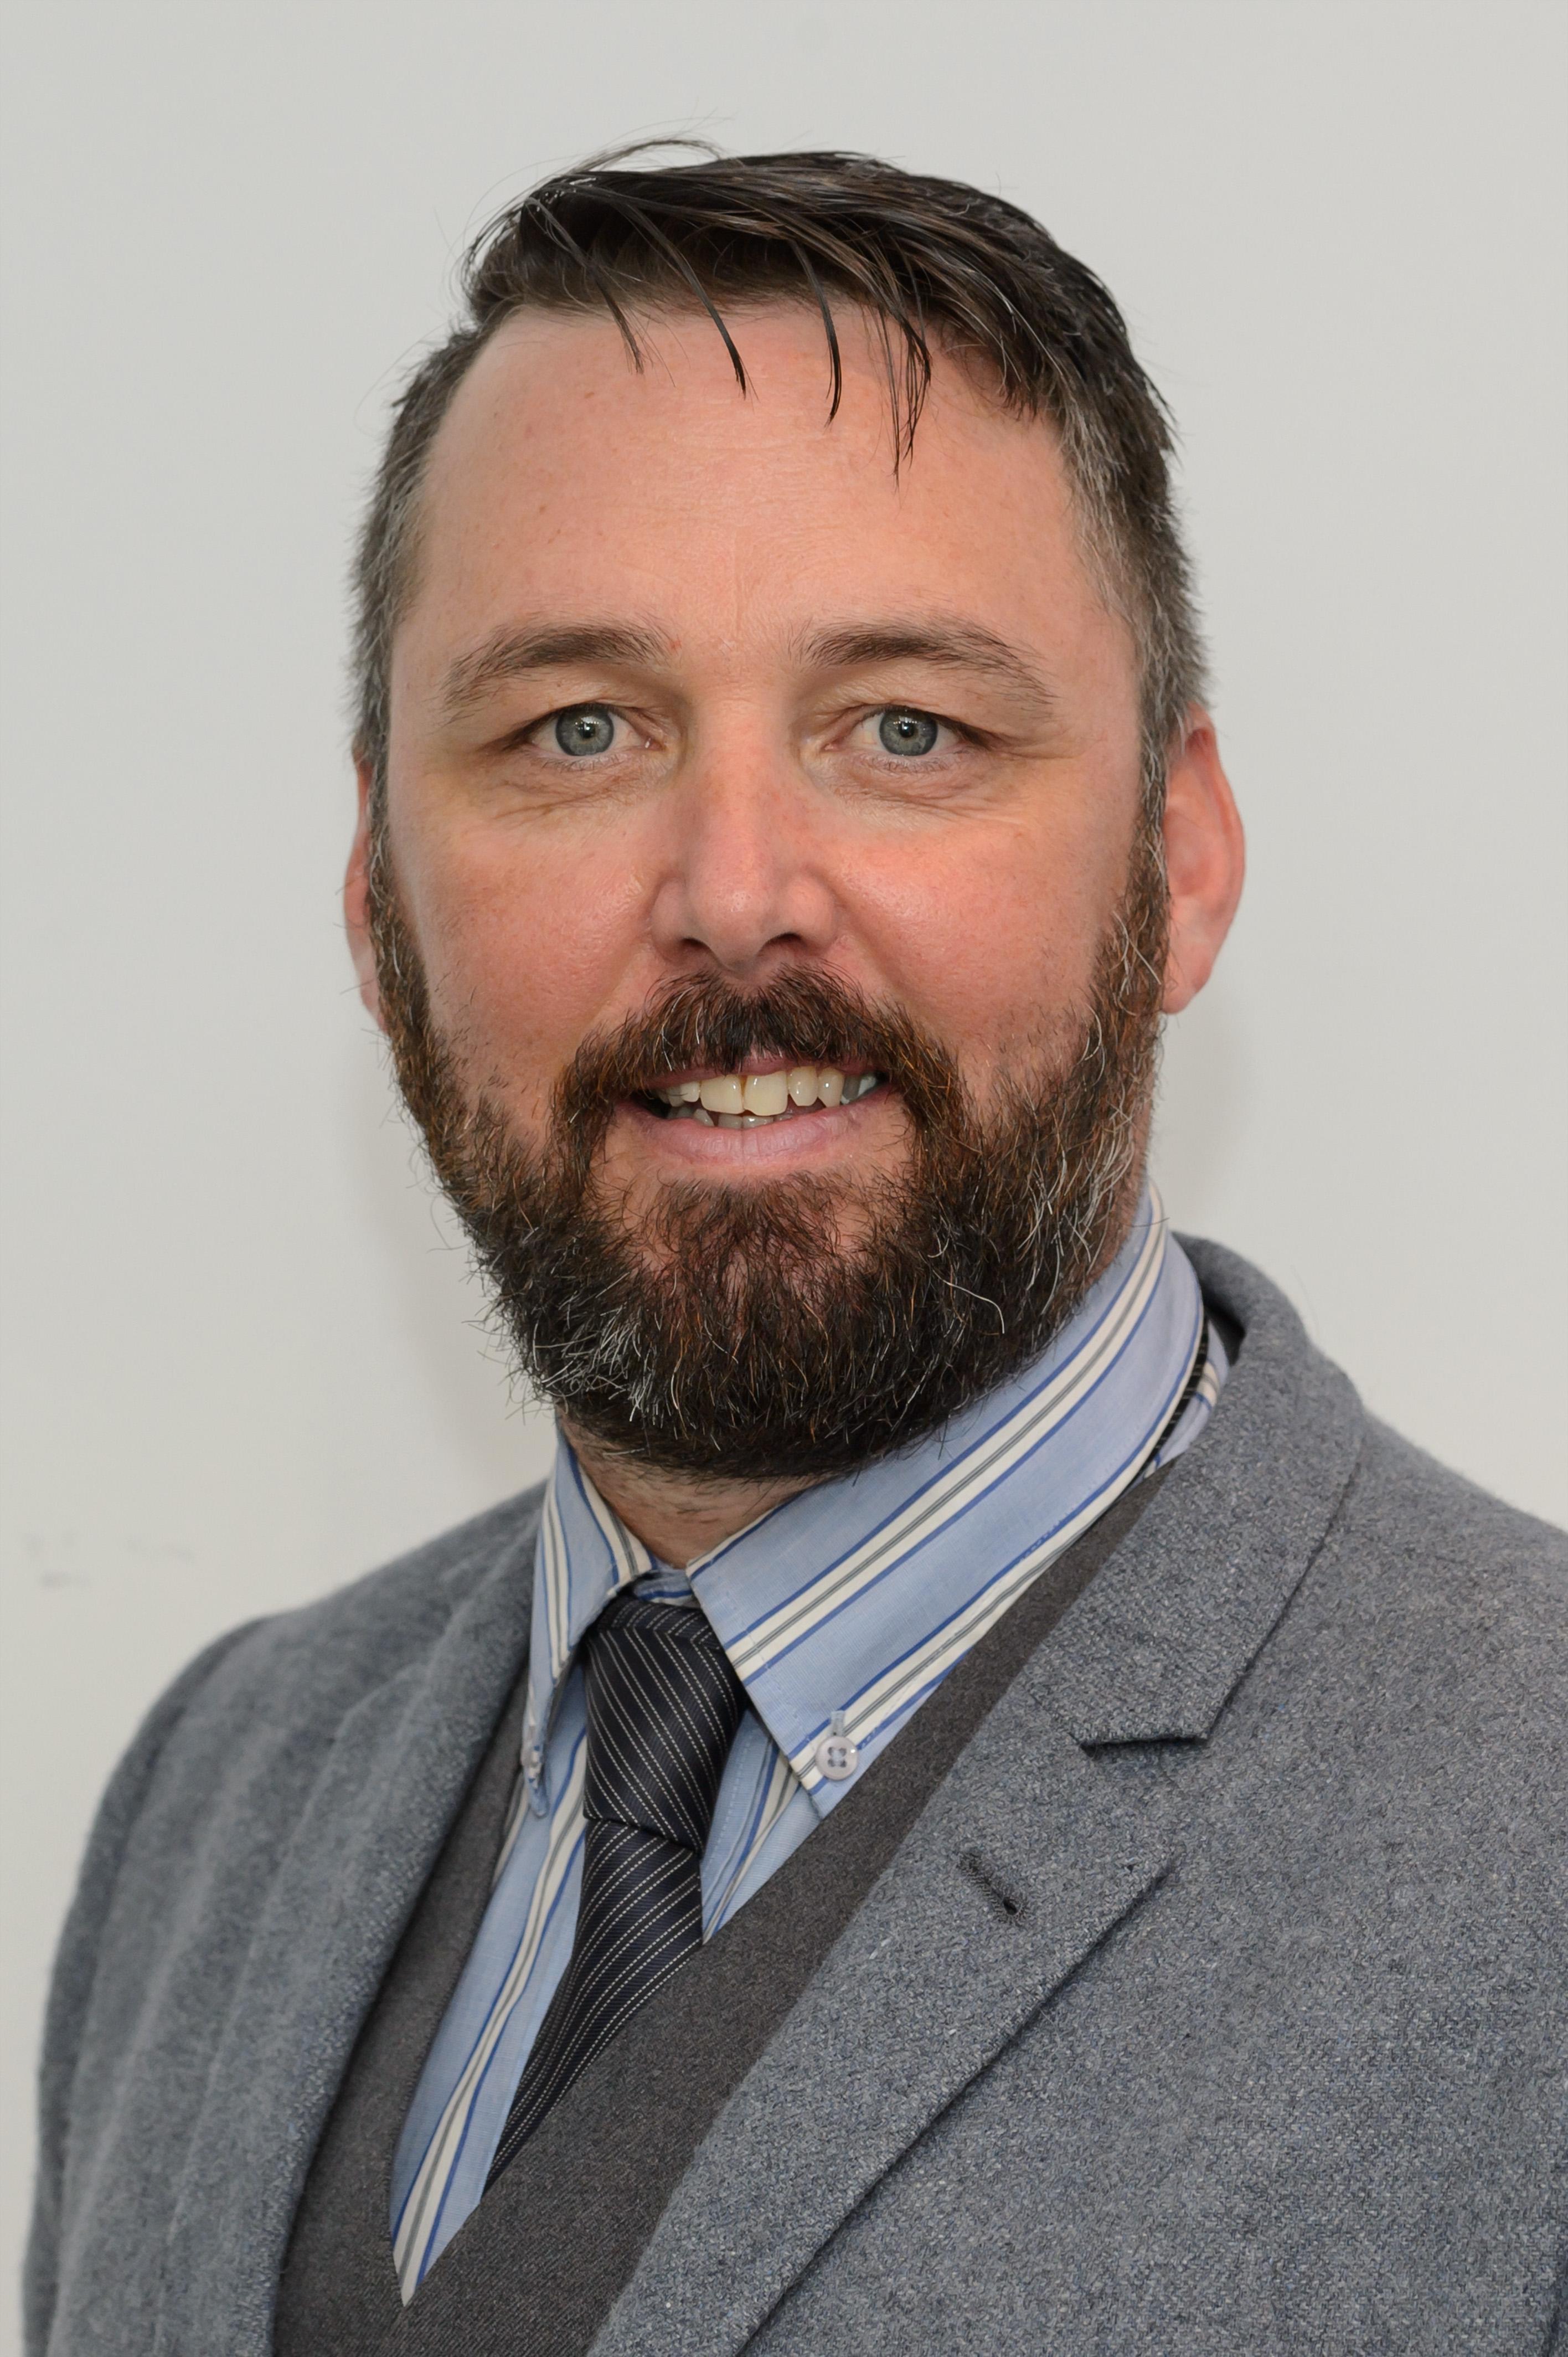 Michael Stokes, Head of Hub Operations